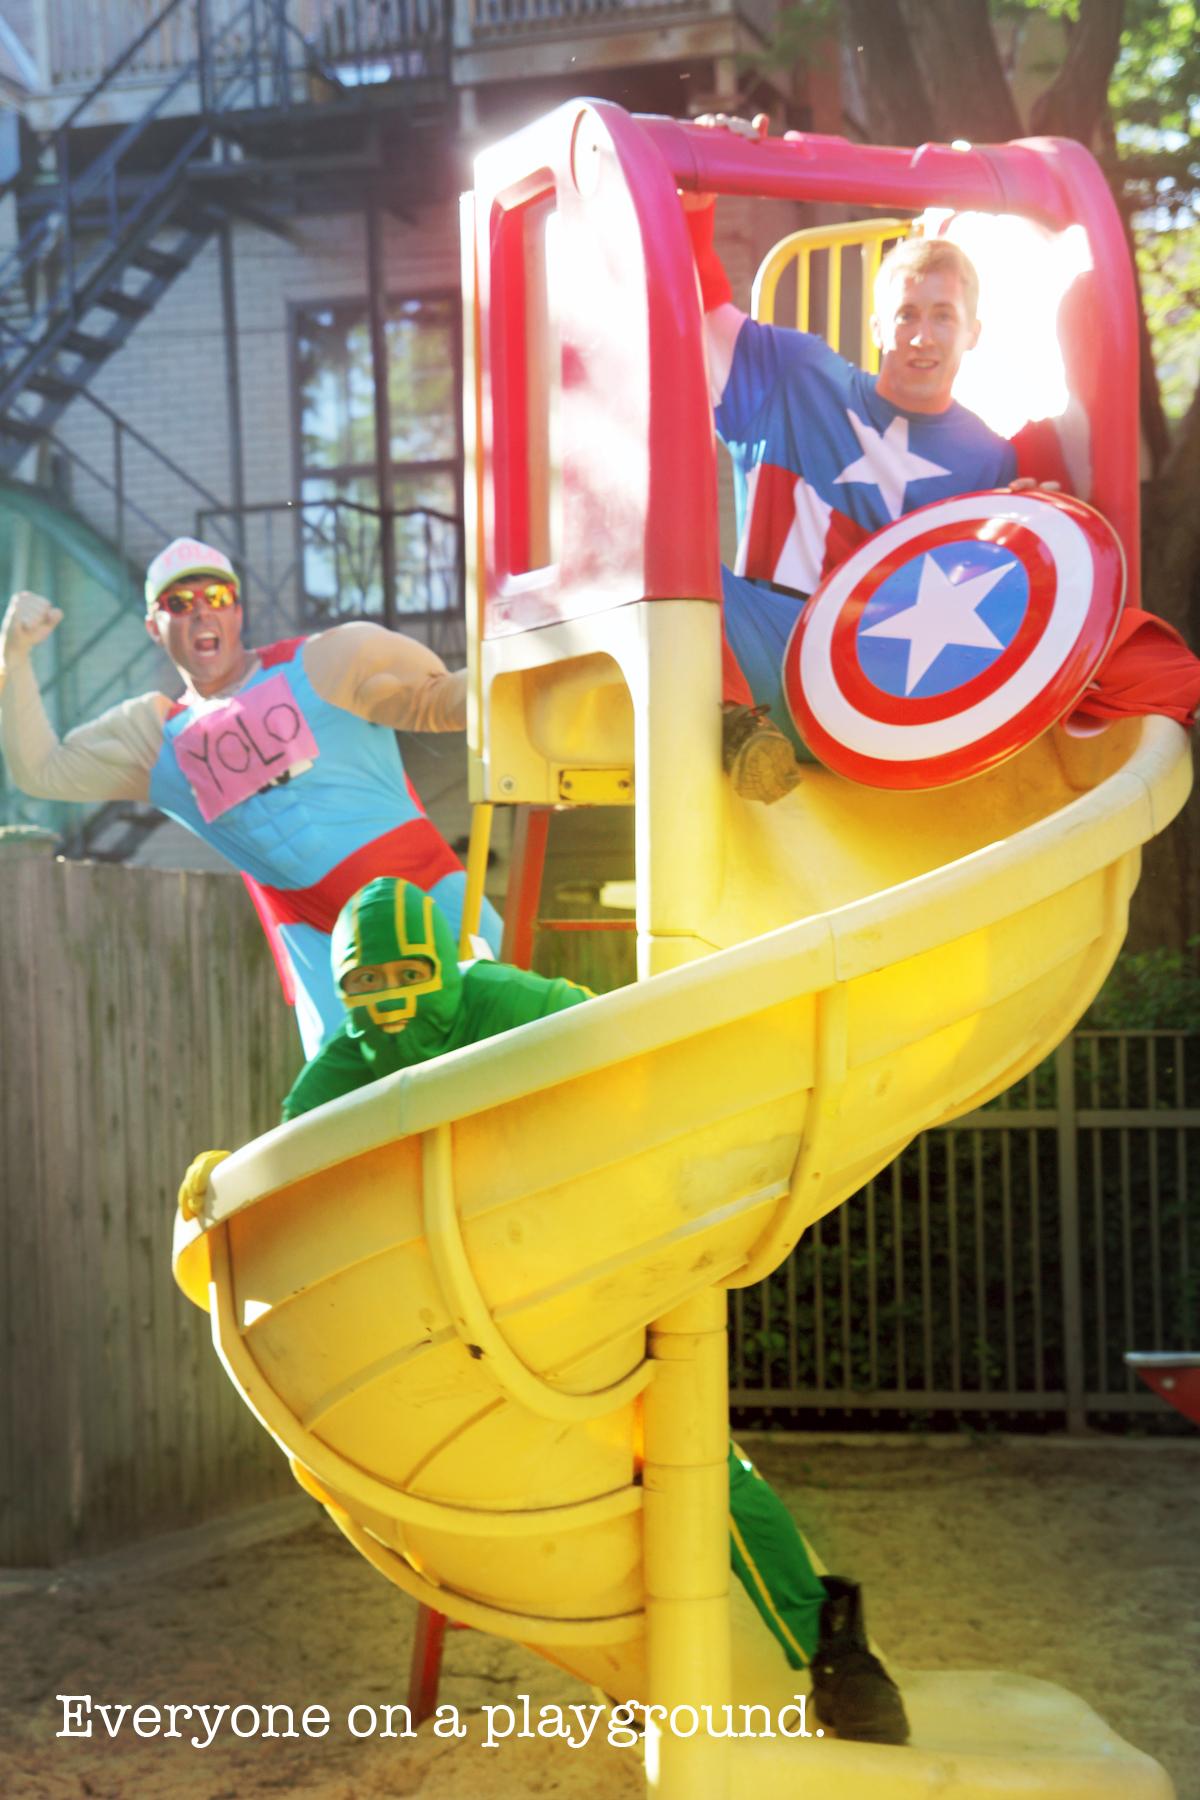 Super heroes themed photo scavenger hunt